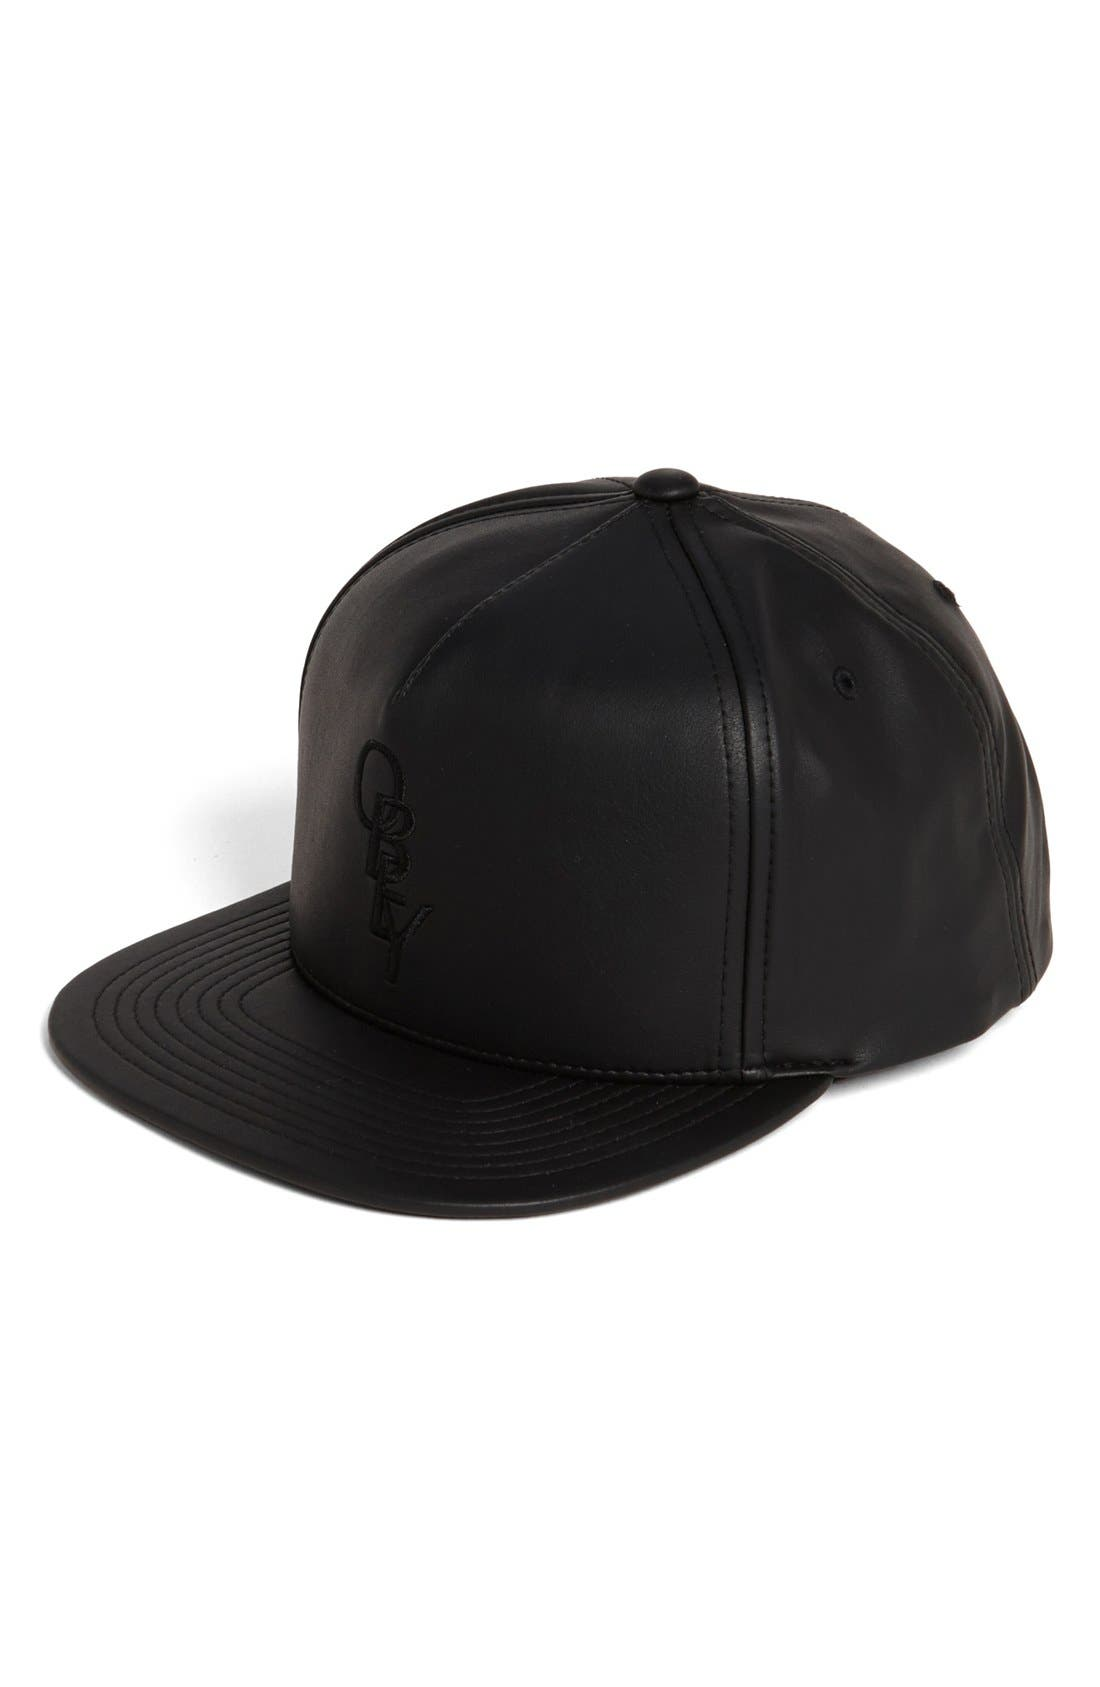 Alternate Image 1 Selected - Obey 'Premier' Snapback Baseball Cap